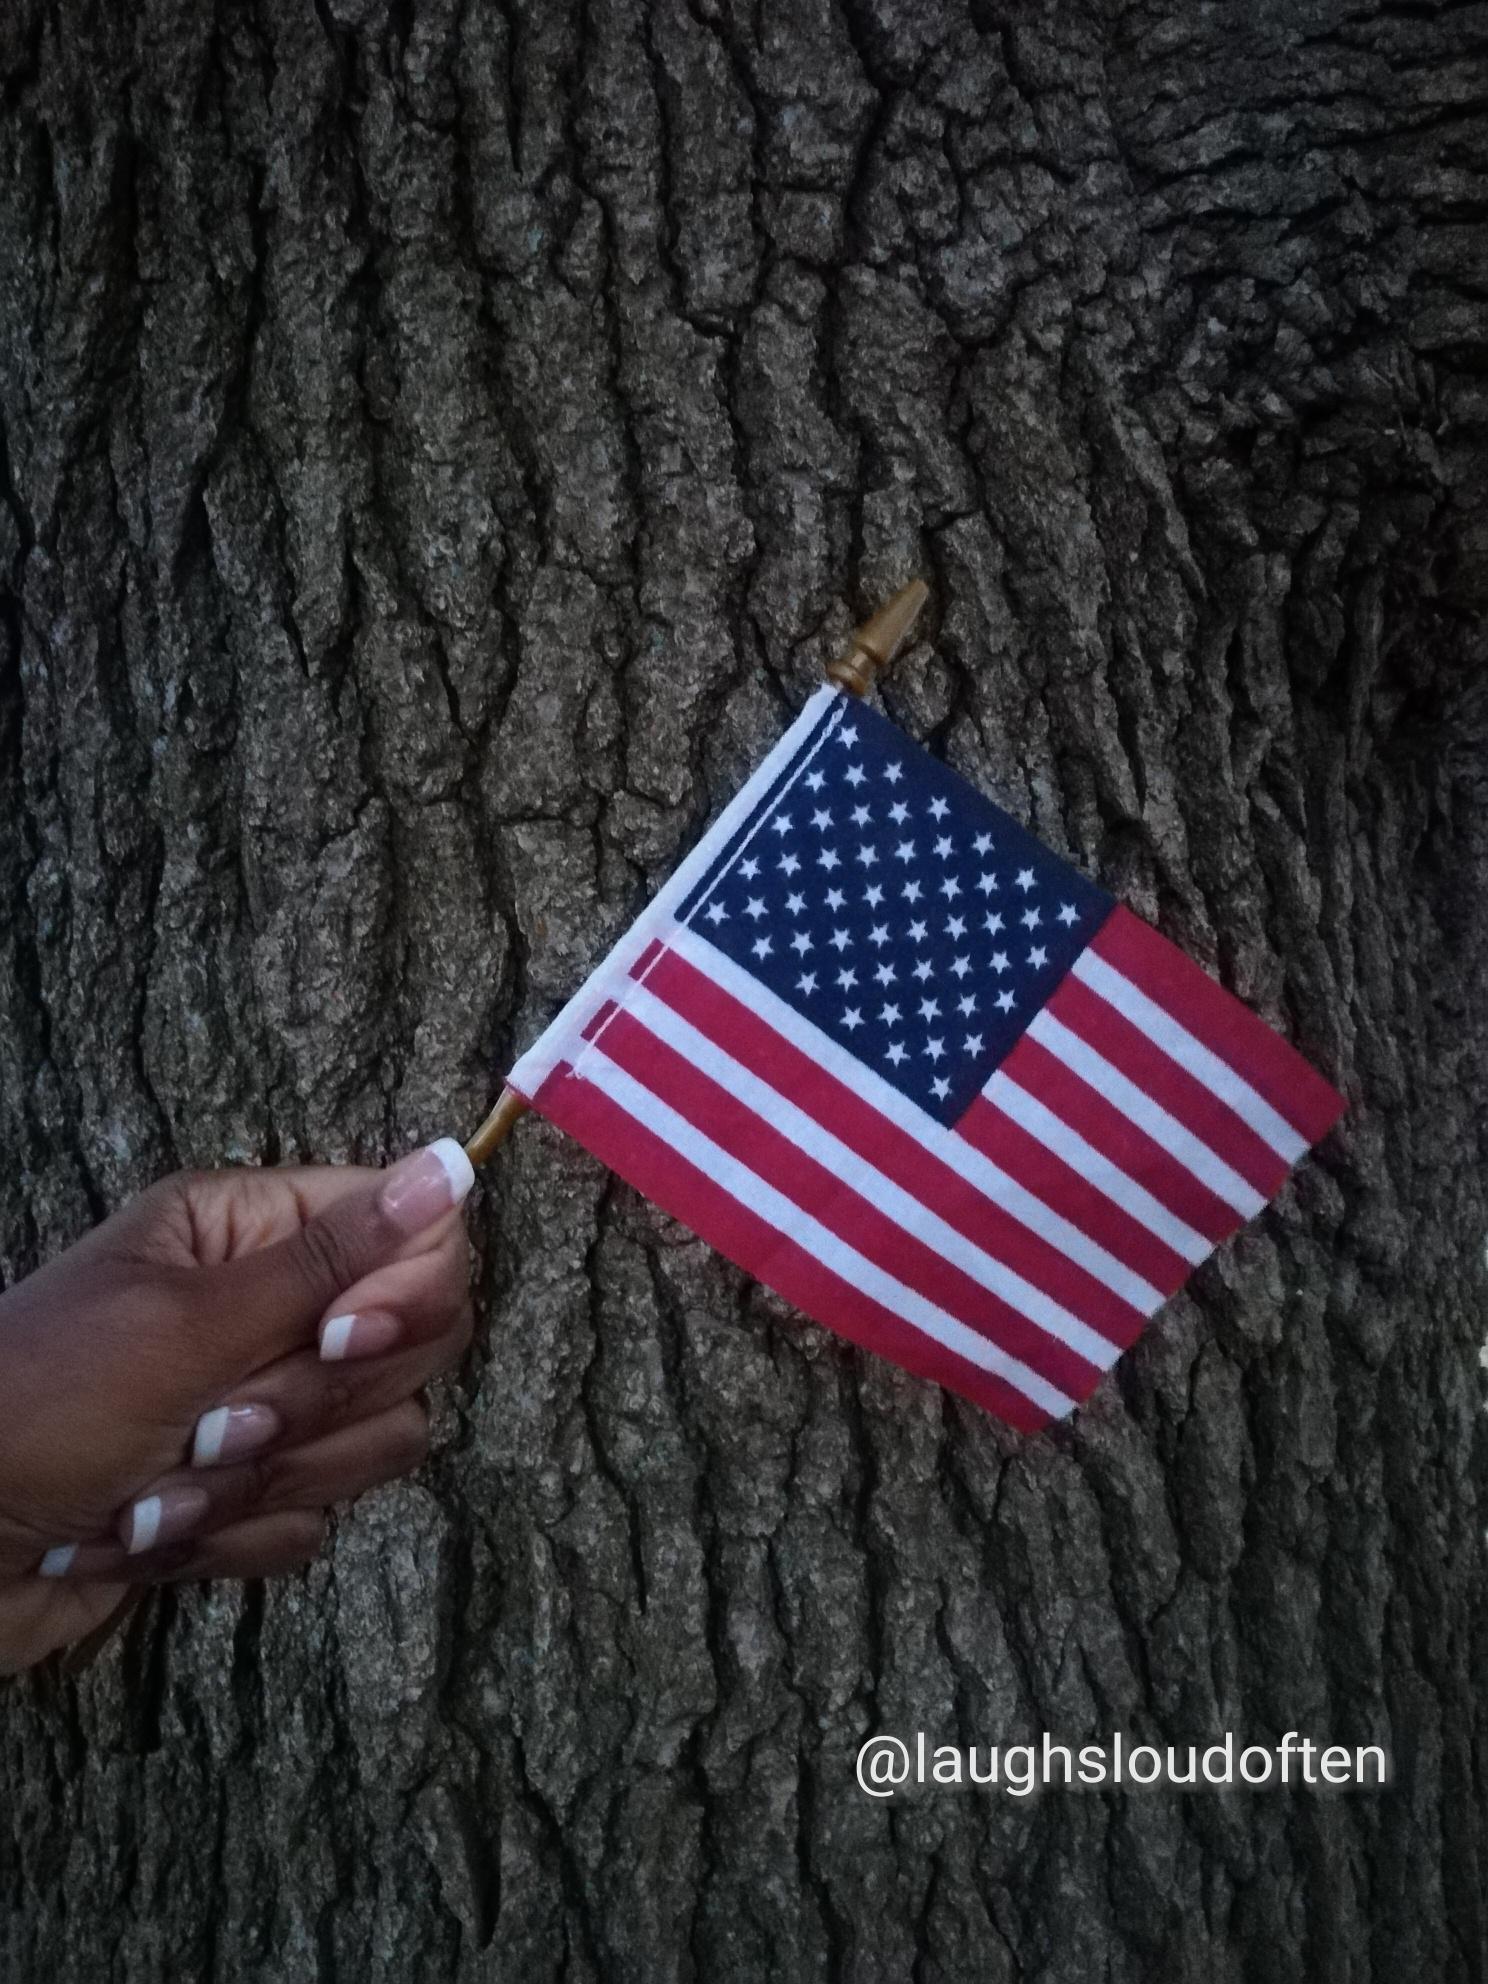 A Prayer for America